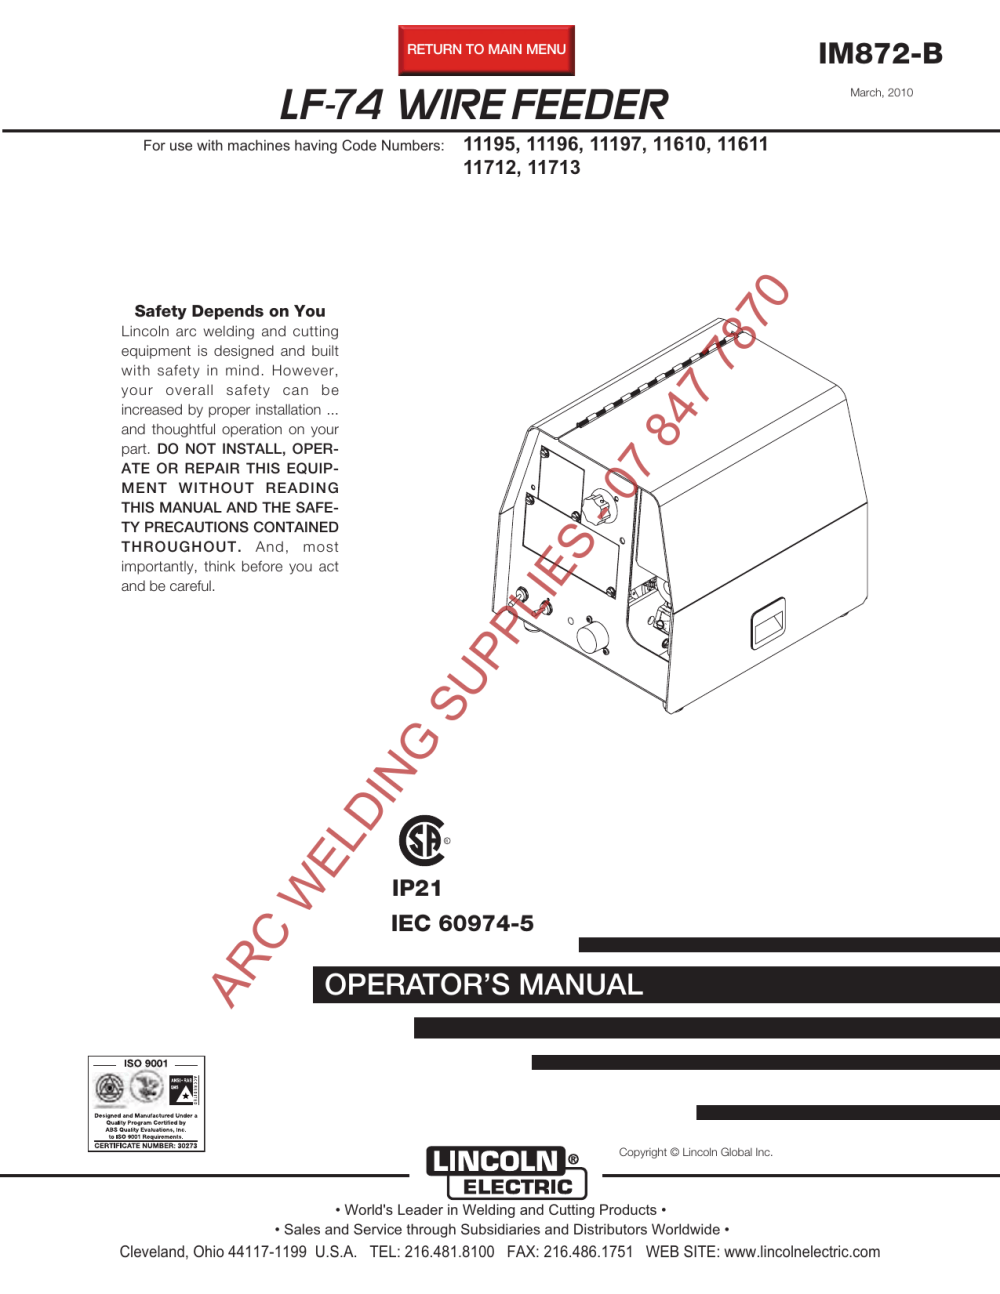 medium resolution of lf 74 wire feeder im872 b